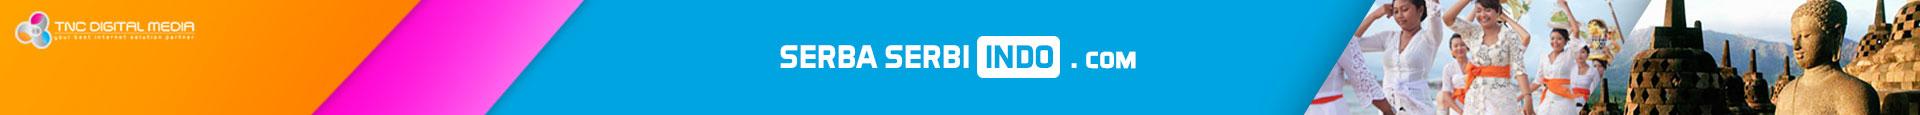 Serba Serbi Indonesia